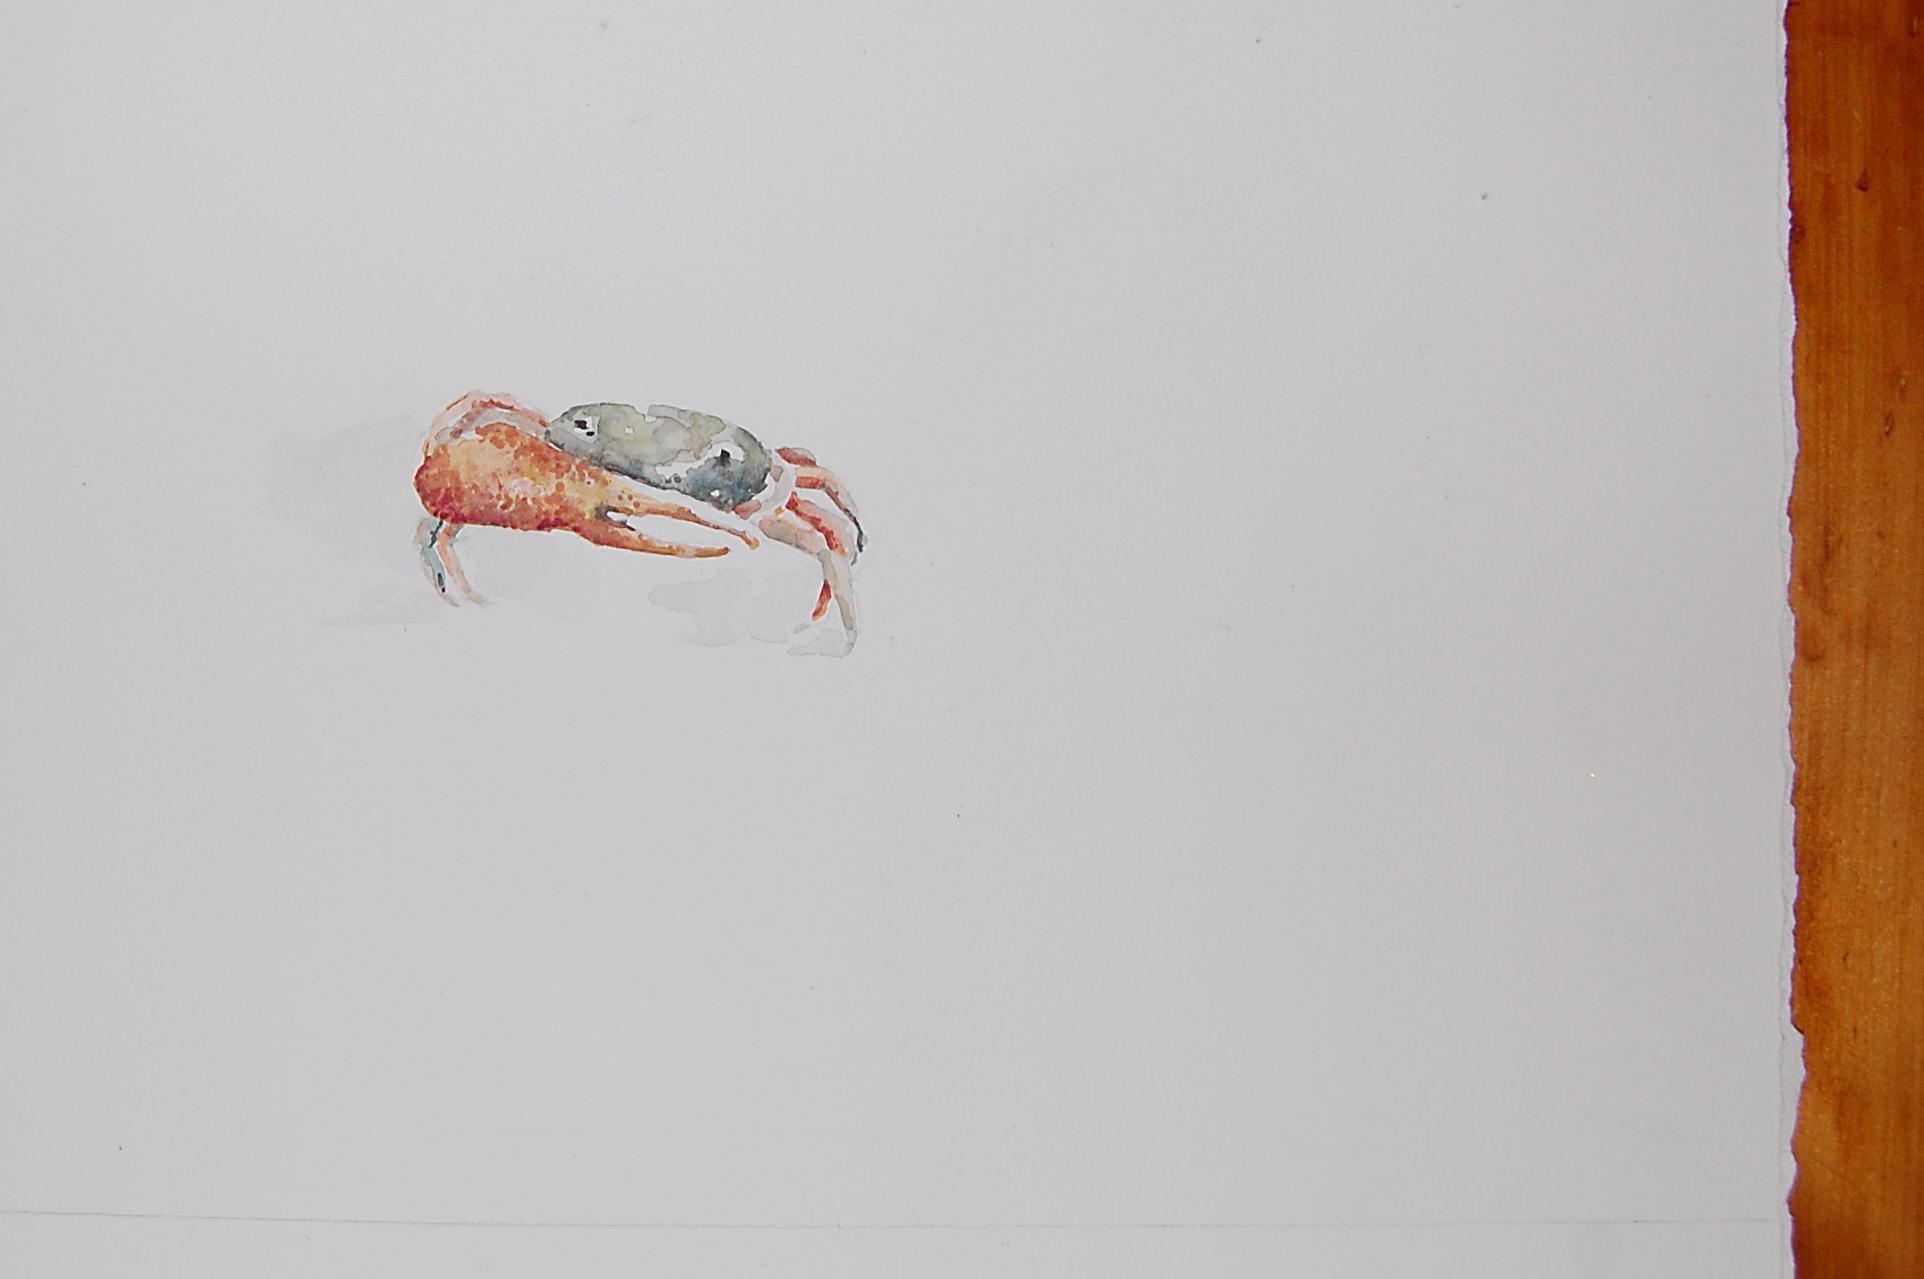 illustration-crab.JPG